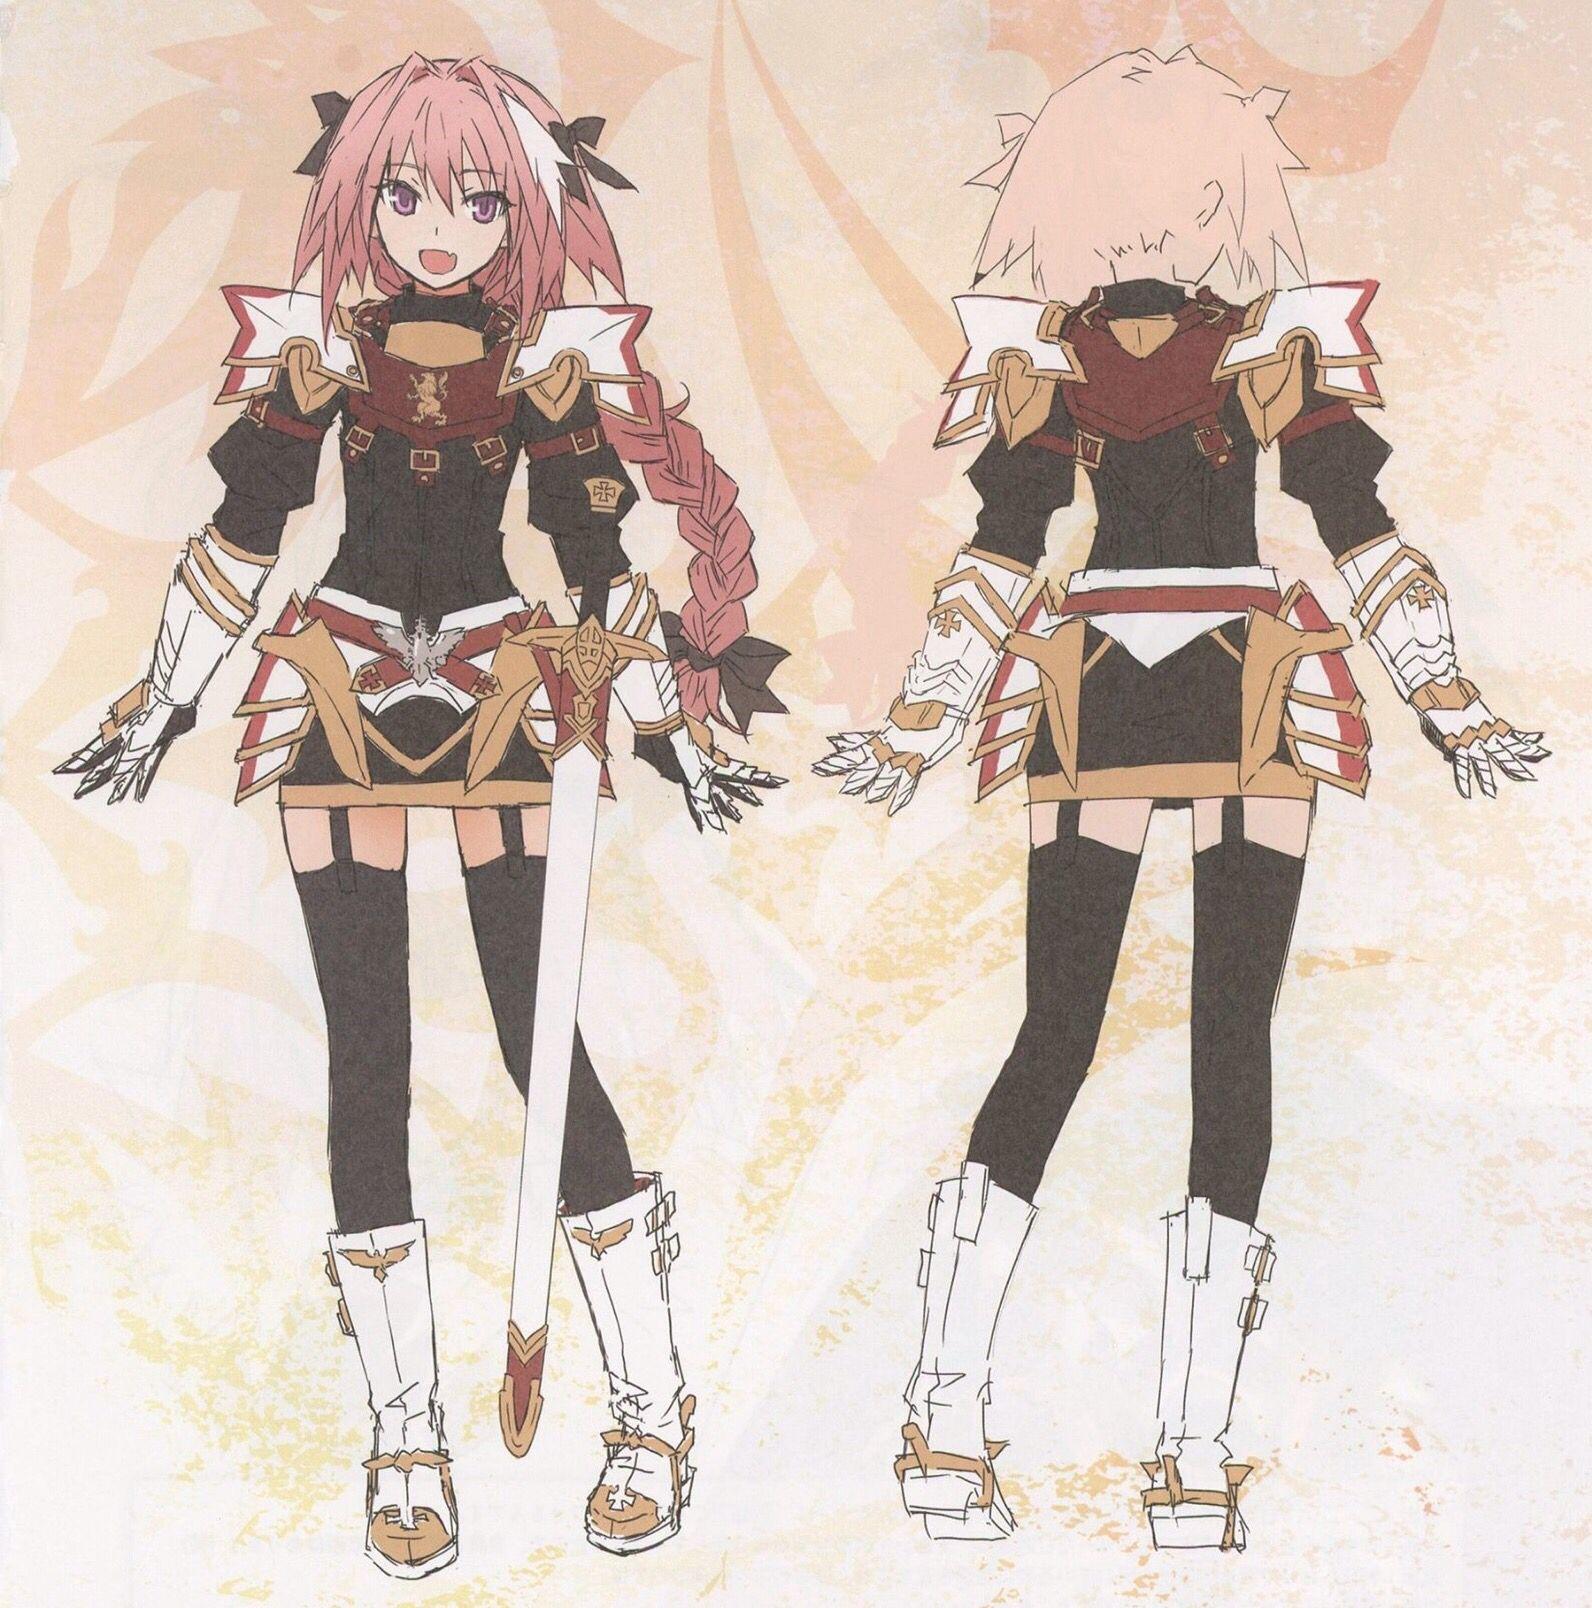 Black rider astolfo | Anime, Zelda characters, Carolingian